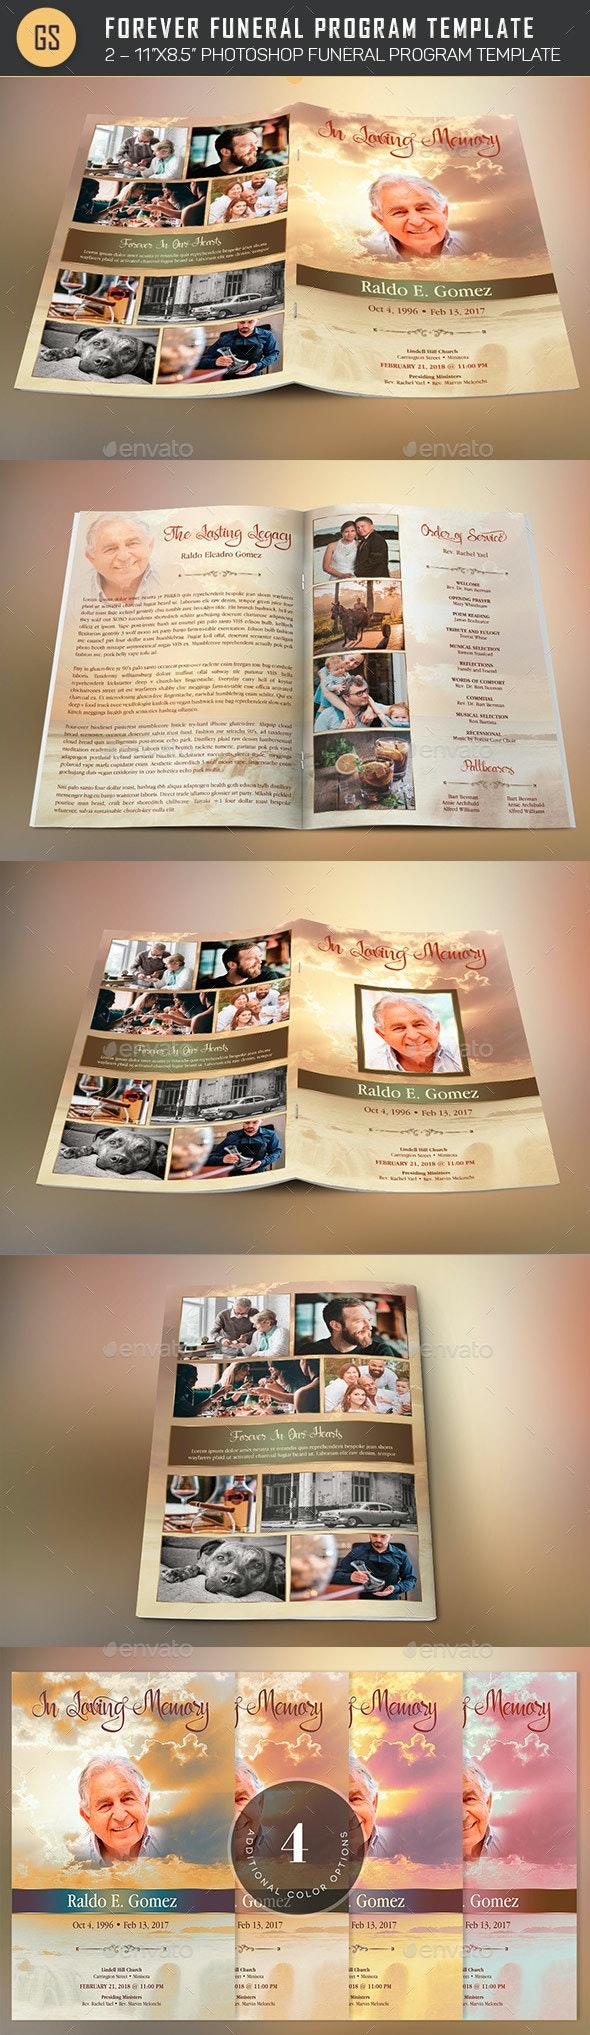 Forever Funeral Program Template - Informational Brochures